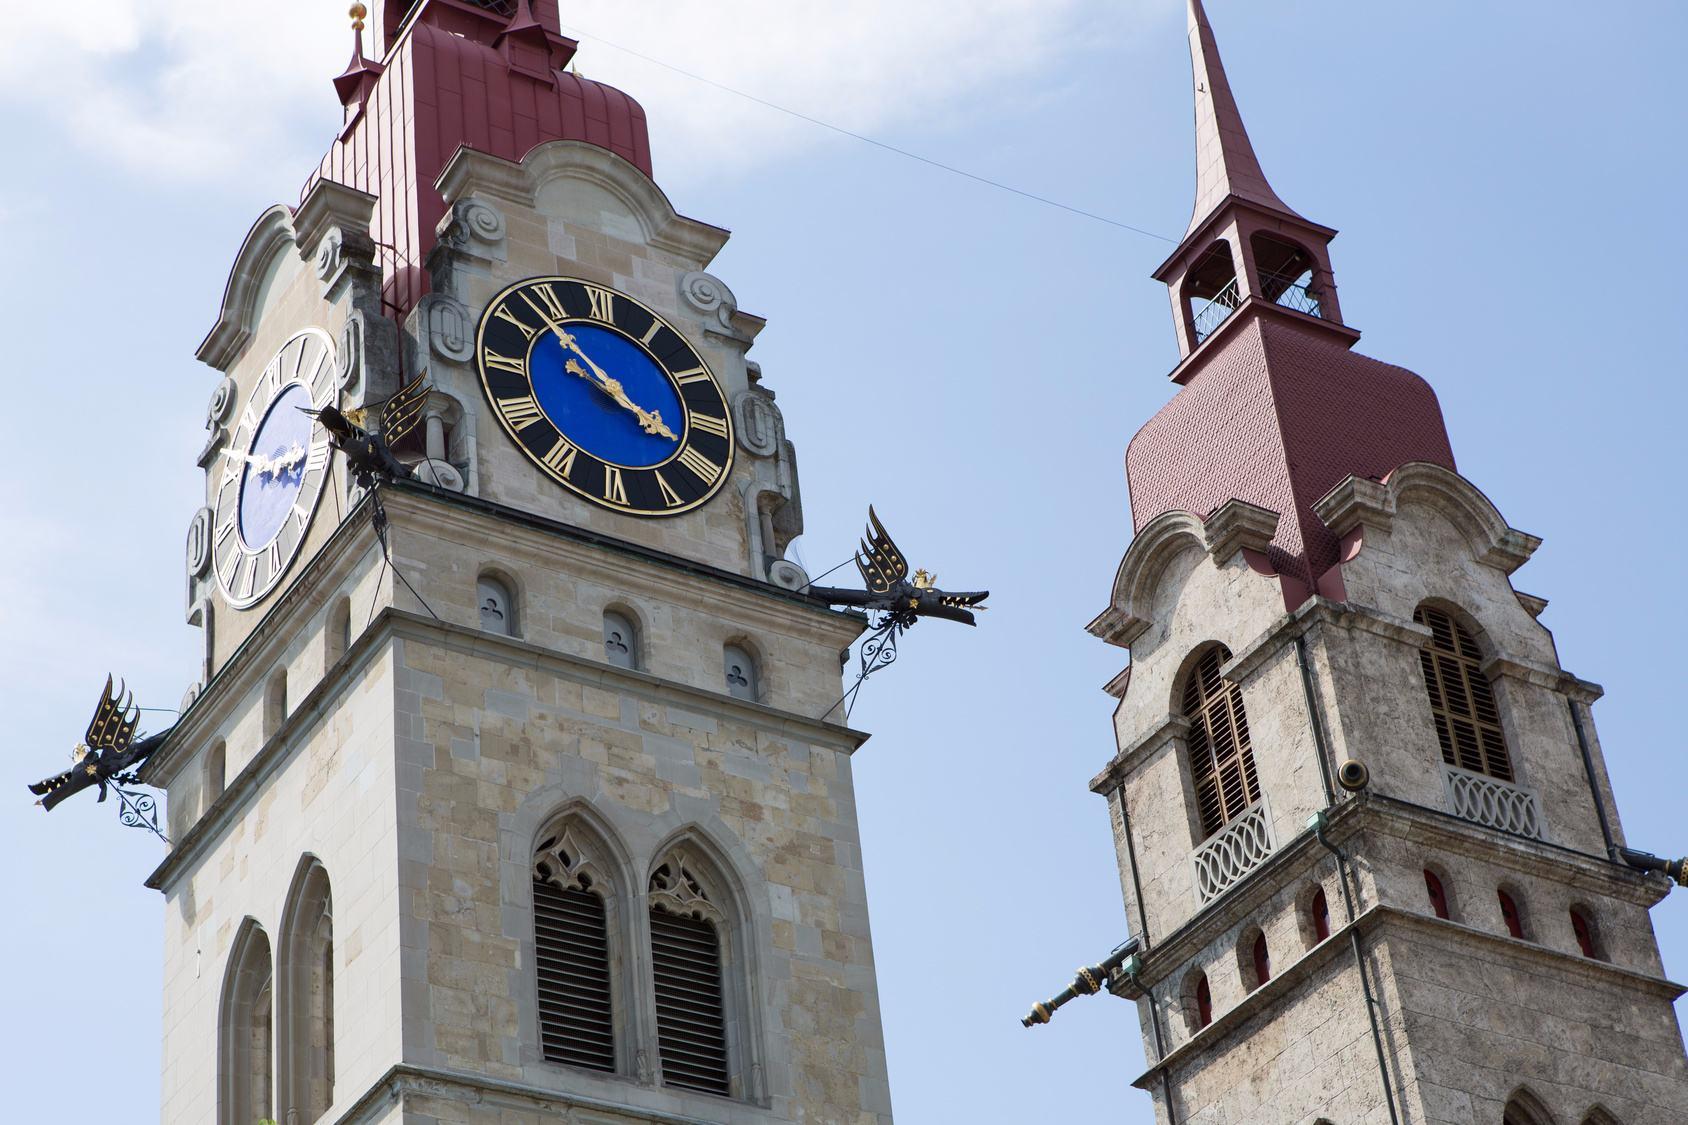 Winterthur historical buildings